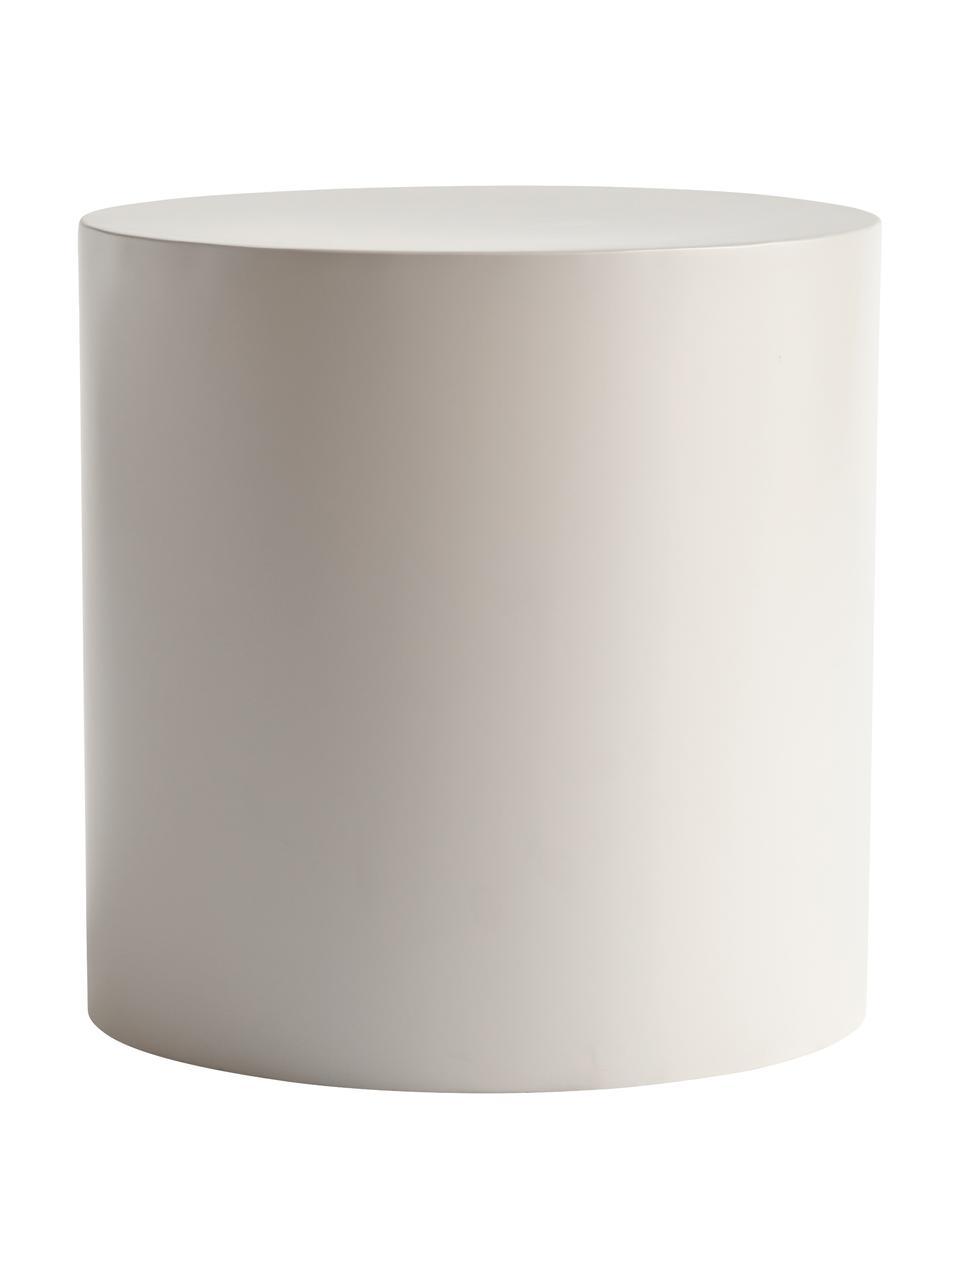 Tavolino rotondo in metallo grigio chiaro Metdrum, Metallo, Grigio chiaro, Ø 40 x Alt. 40 cm